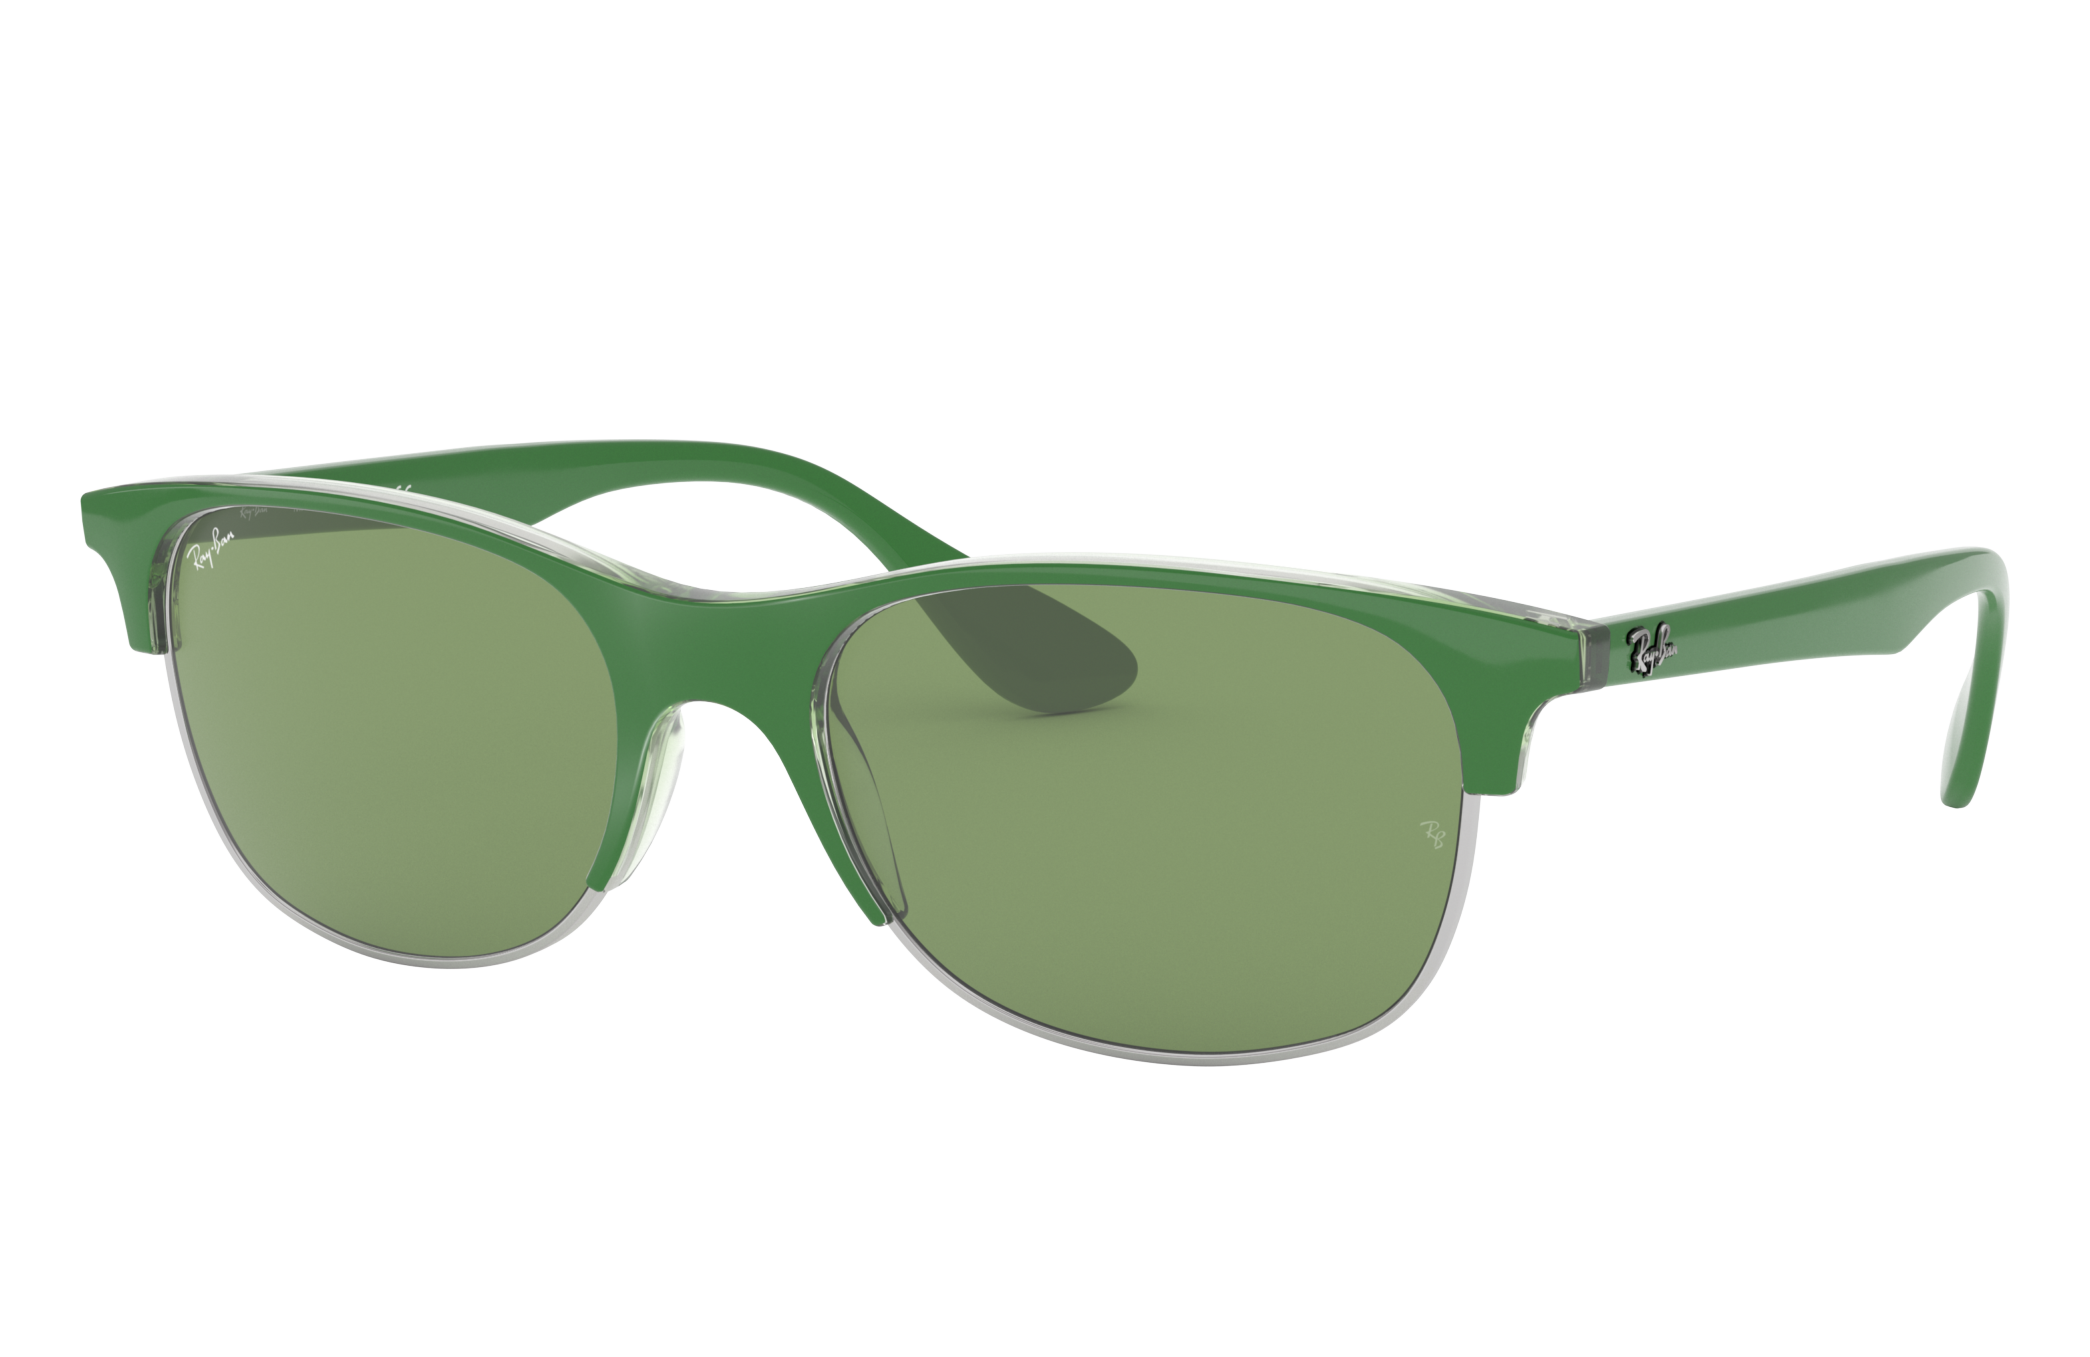 Ray-Ban Rb4319 Green, Green Lenses - RB4319